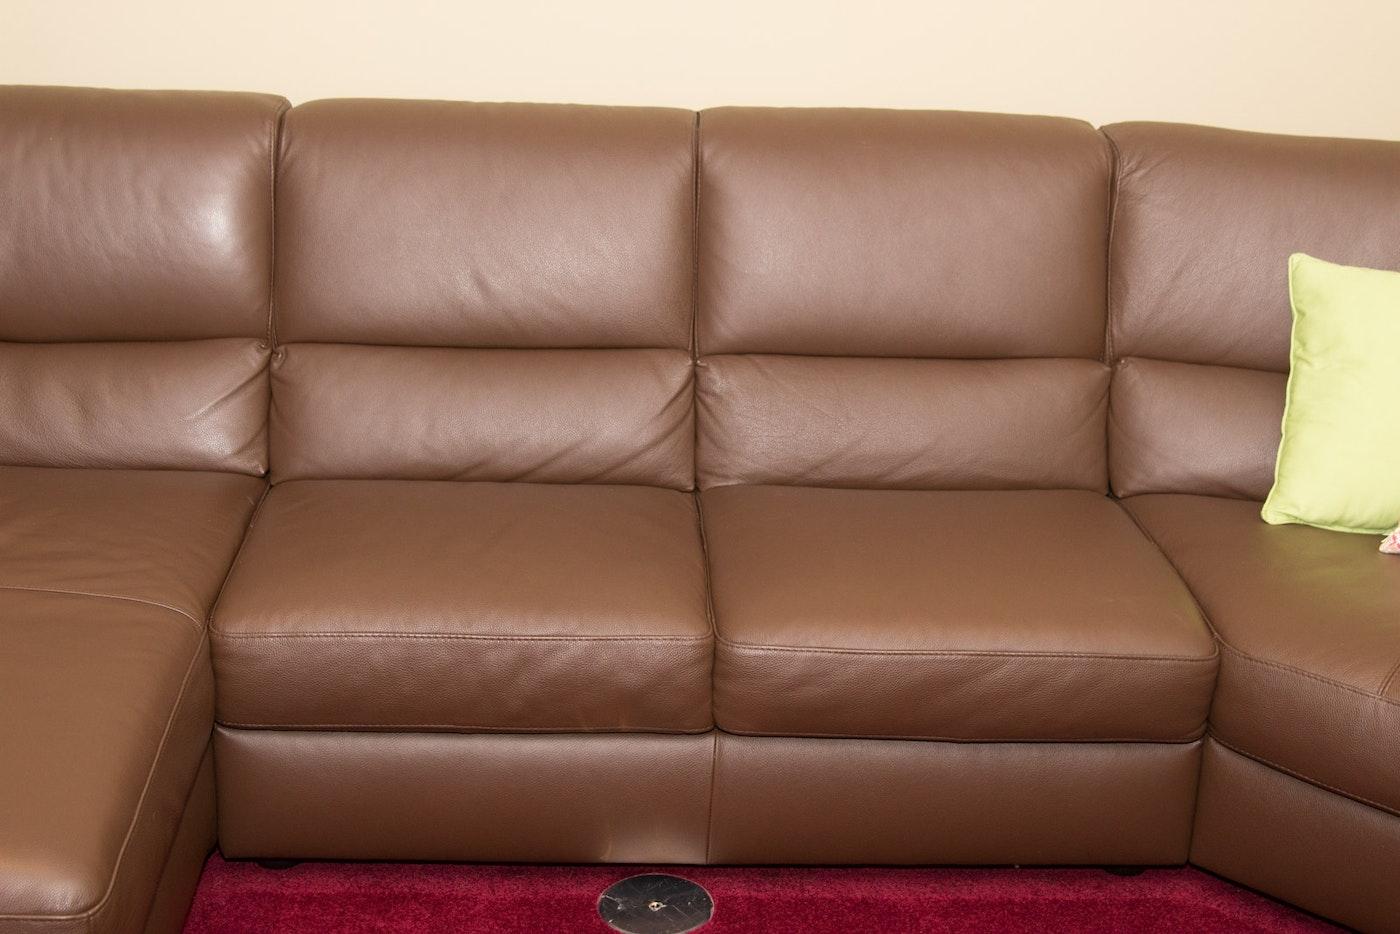 Italsofa Chocolate Brown Leather Sectional Sofa Ebth